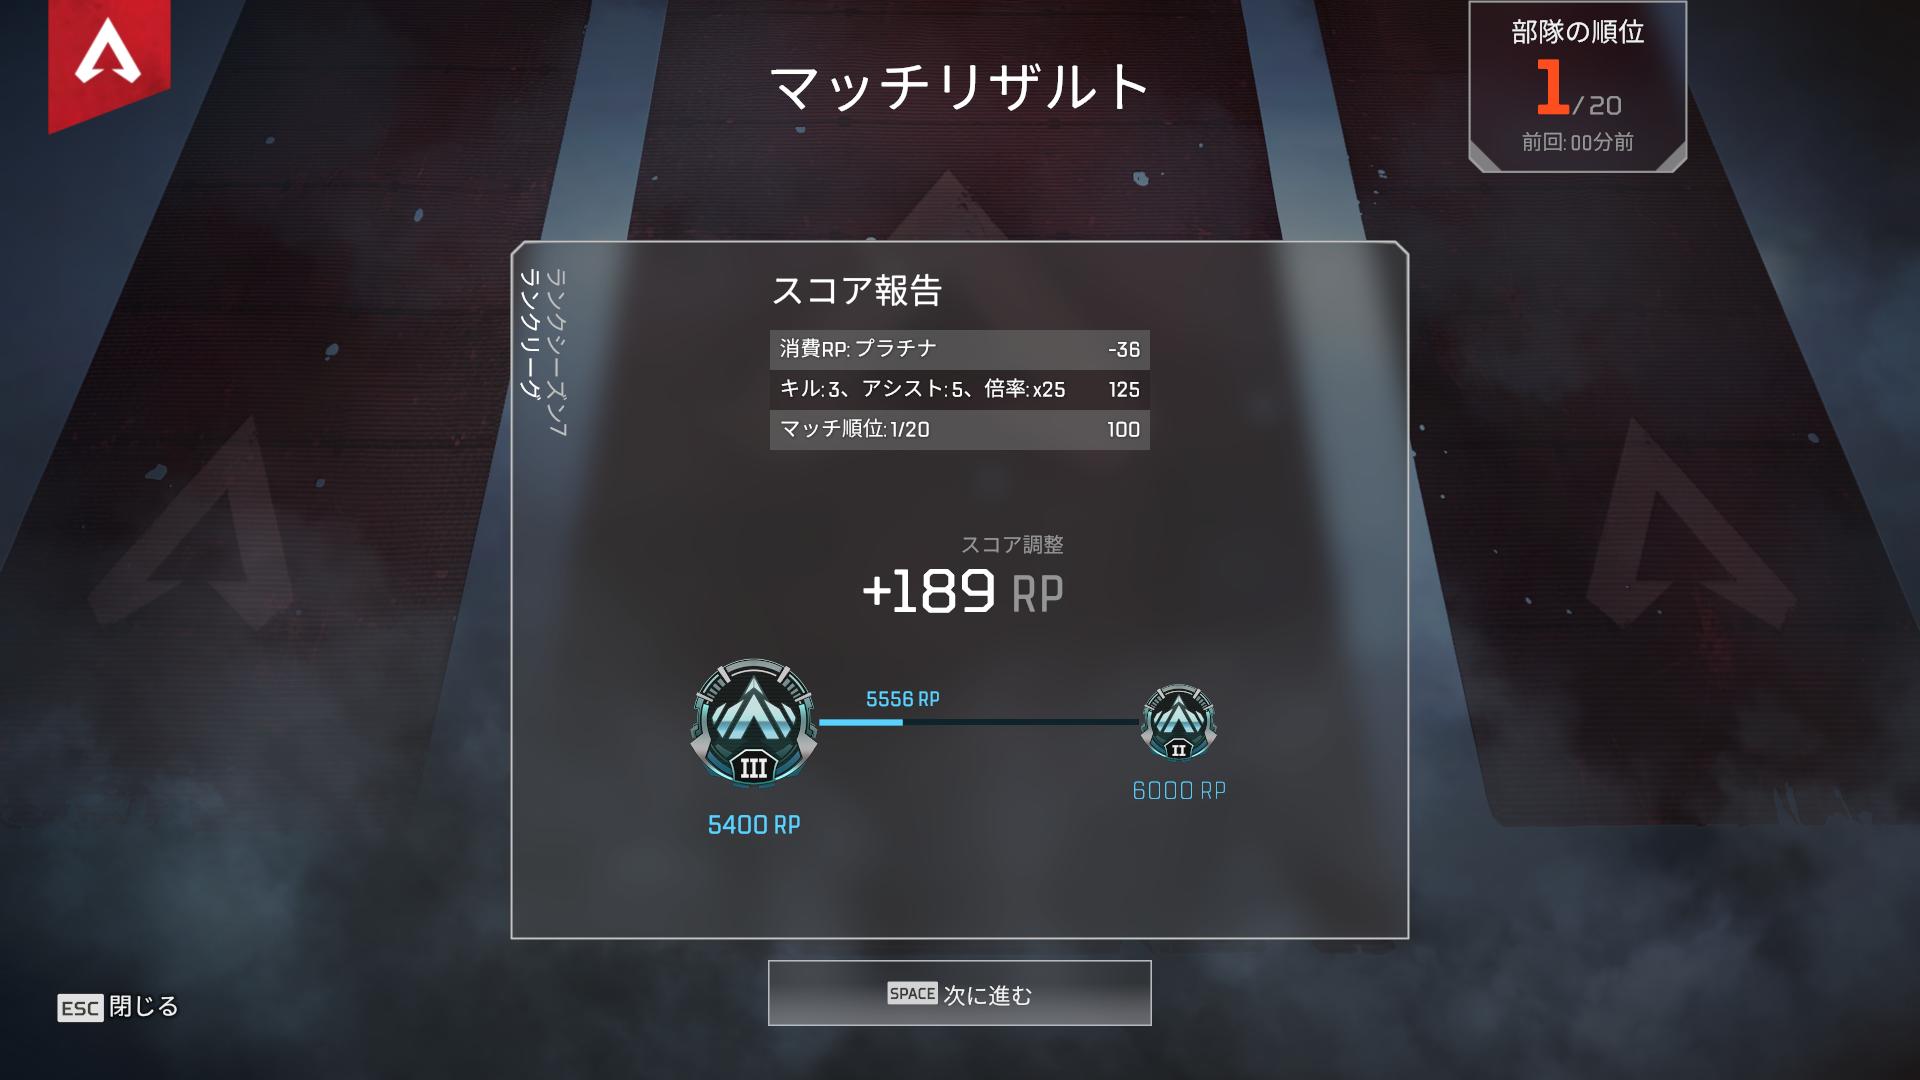 f:id:kyoumoe:20201129234535p:plain